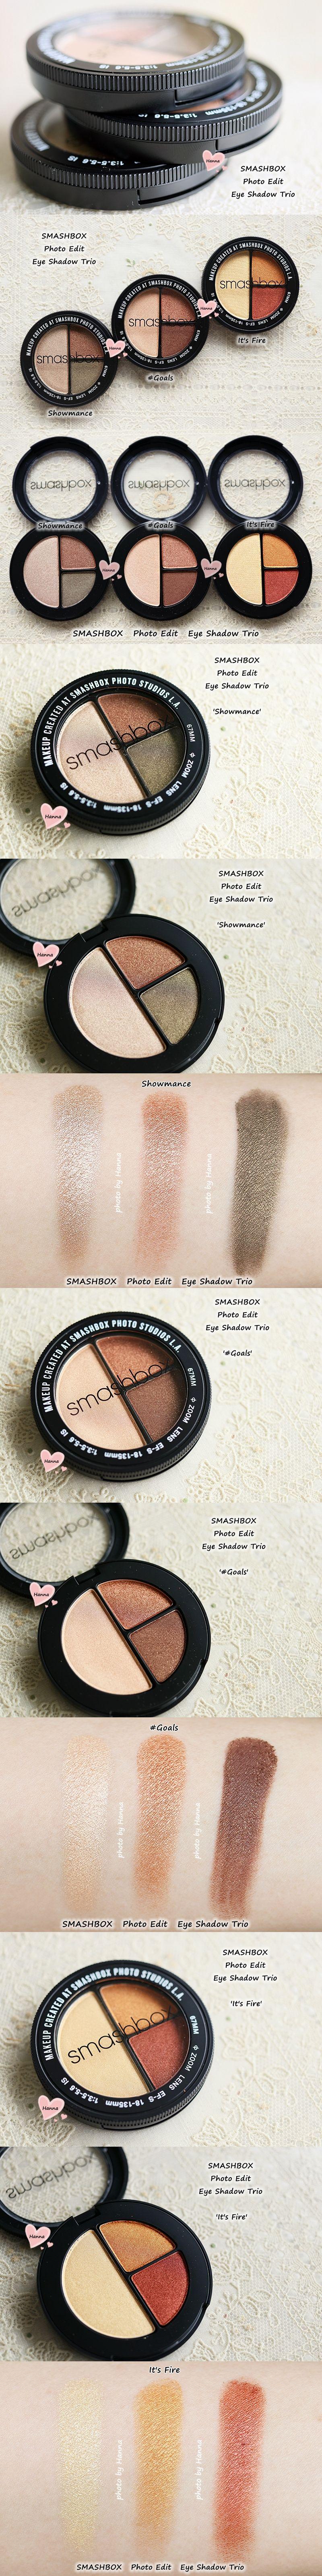 Photo Edit Eyeshadow Trio - #Goals by Smashbox #3